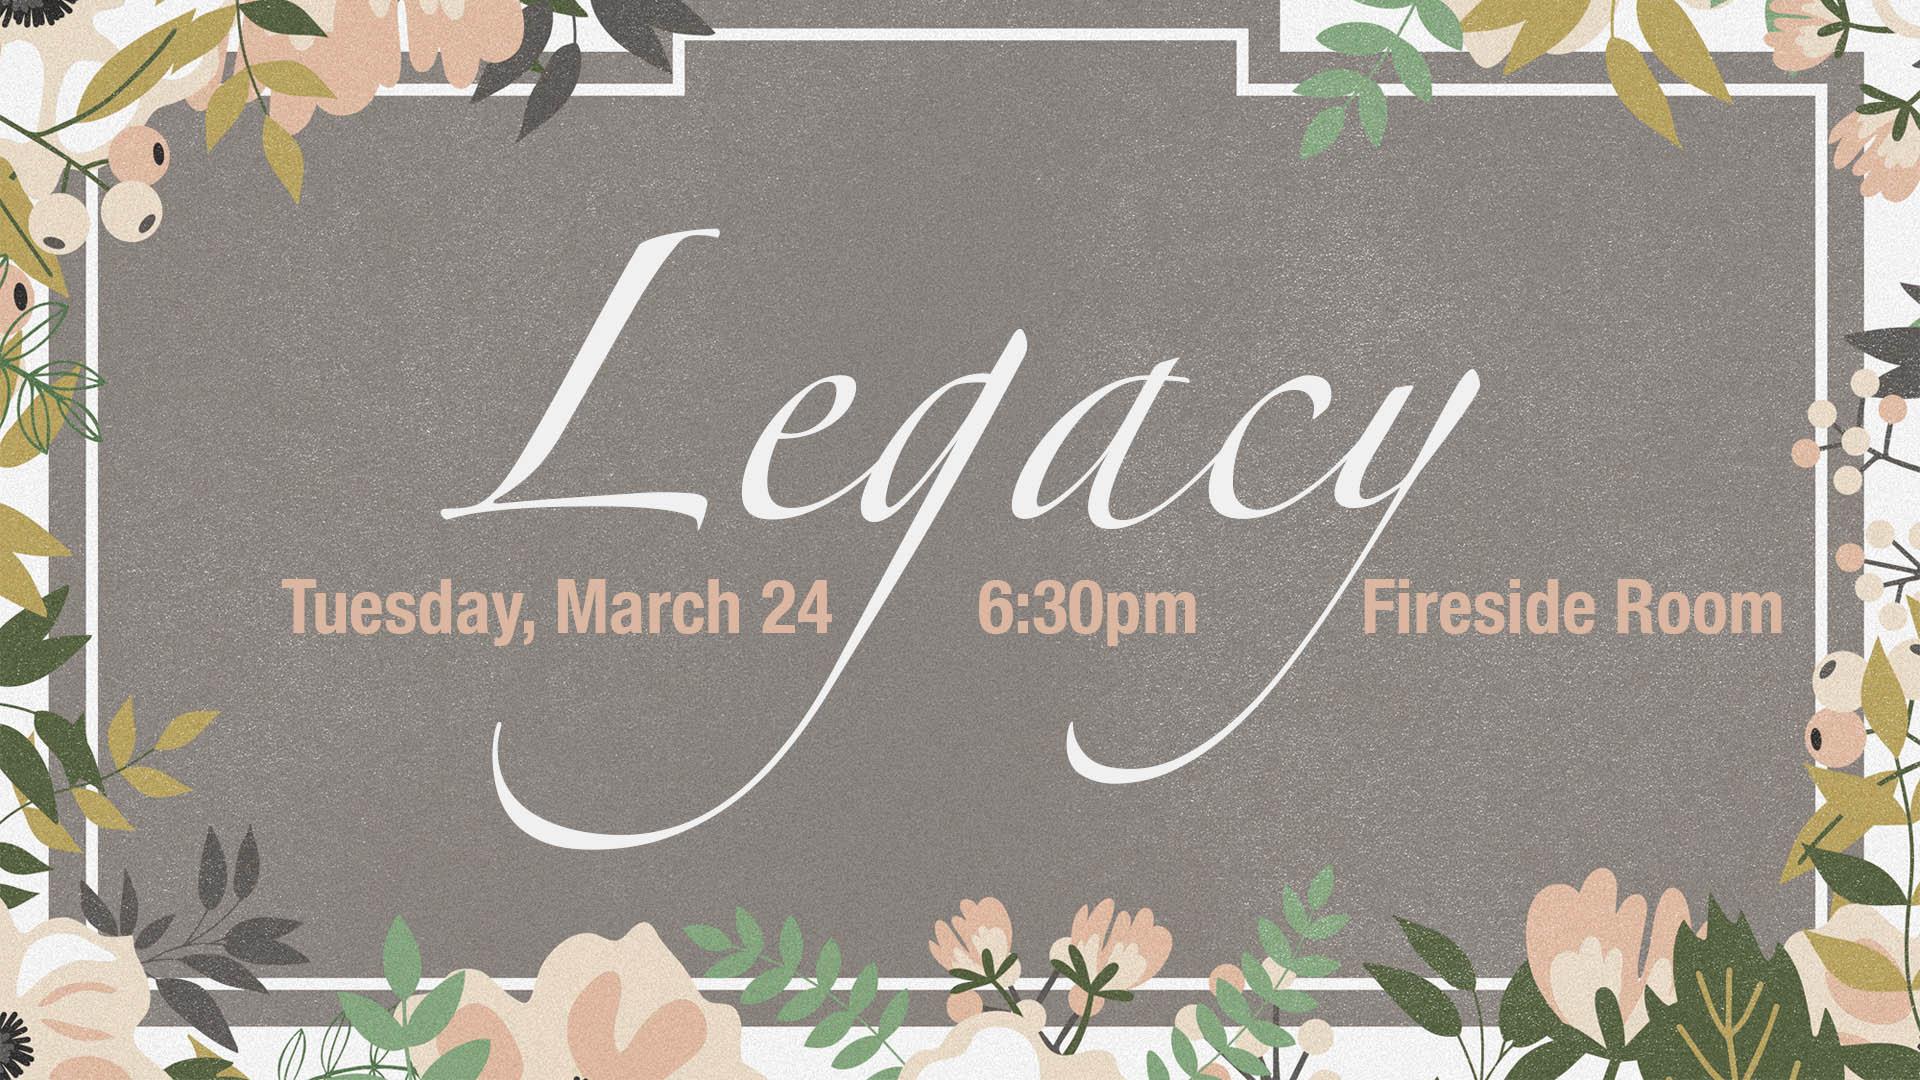 Legacy 3.24.20.jpg